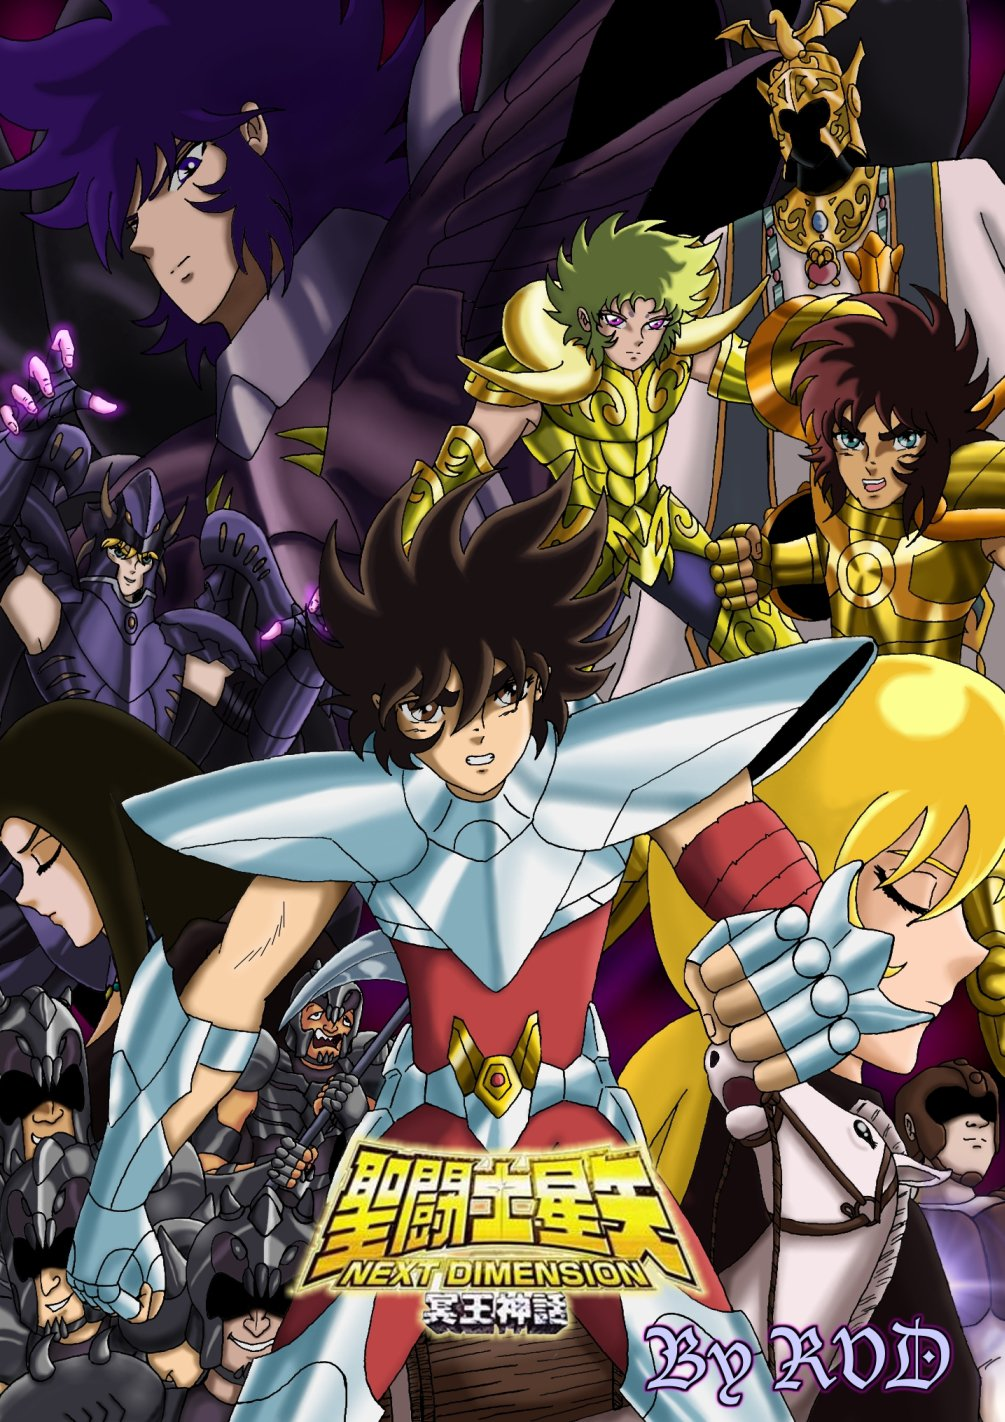 Masami Kurumada Shares Saint Seiya Next Dimension Preview, Manga To Returns In September.